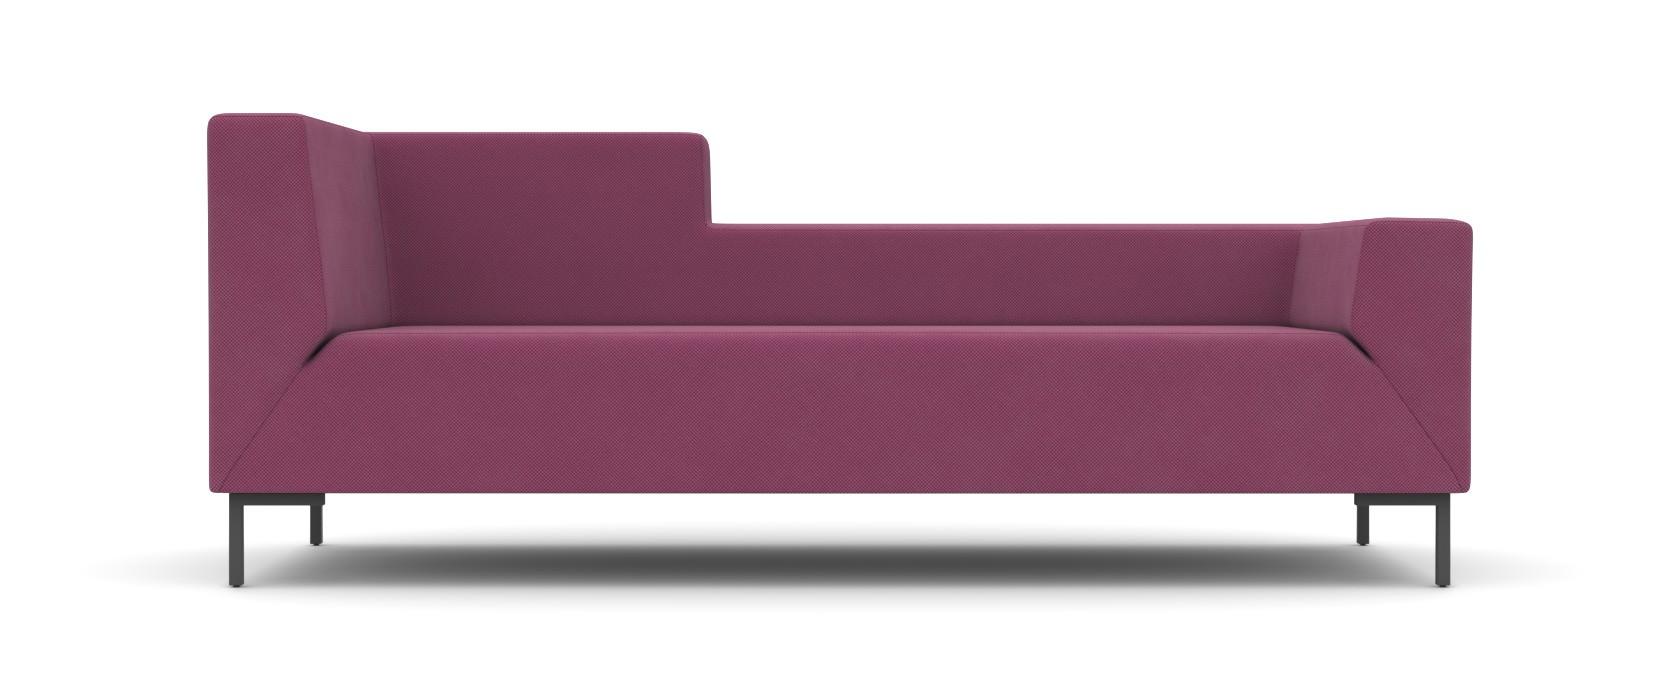 Full Size of 3 Sitzer Sofa Ikea Leder Mit Schlaffunktion Und Bettkasten Federkern Couch Poco Bettfunktion Nockeby Bolzano Mix Petrol Kaufen Günstig 2 1 Stressless Himolla Sofa 3 Sitzer Sofa